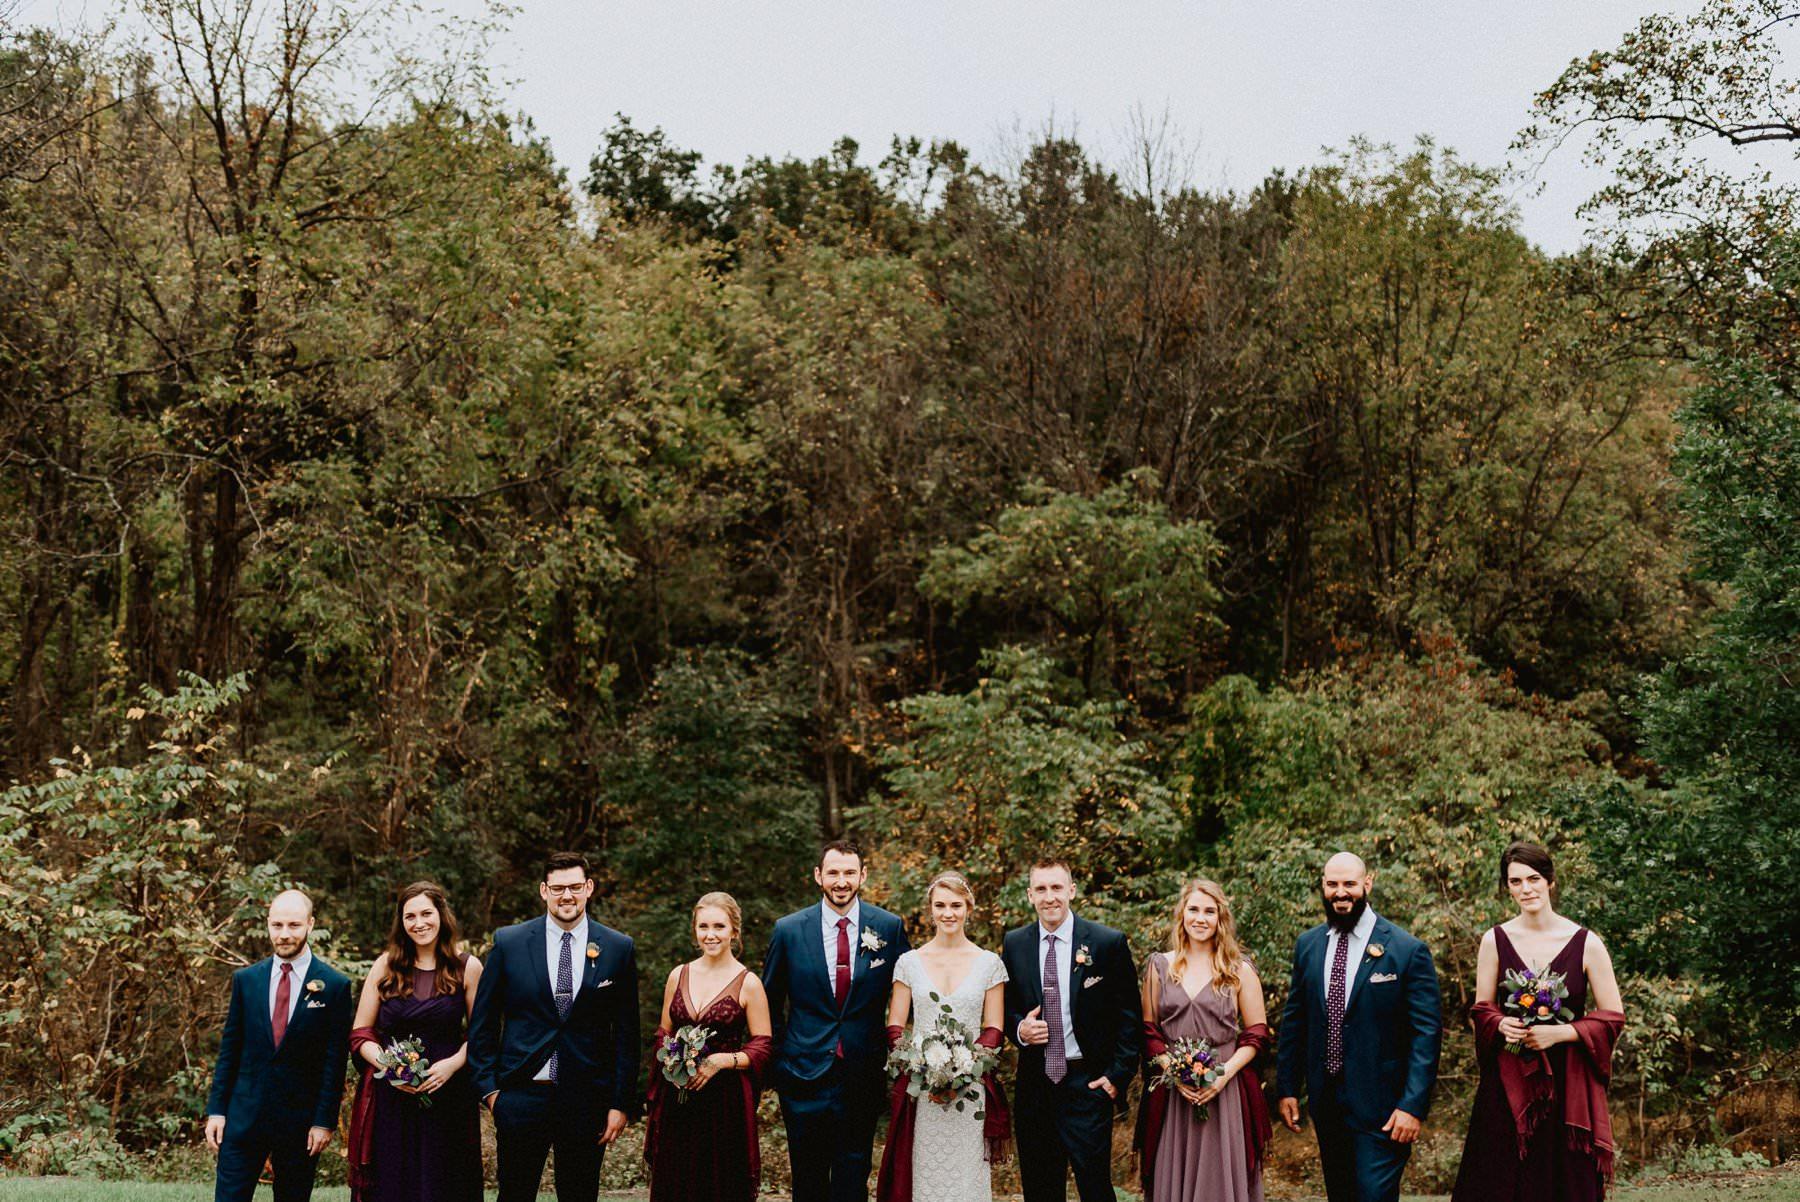 John_James_Audubon_Center_wedding-20.jpg